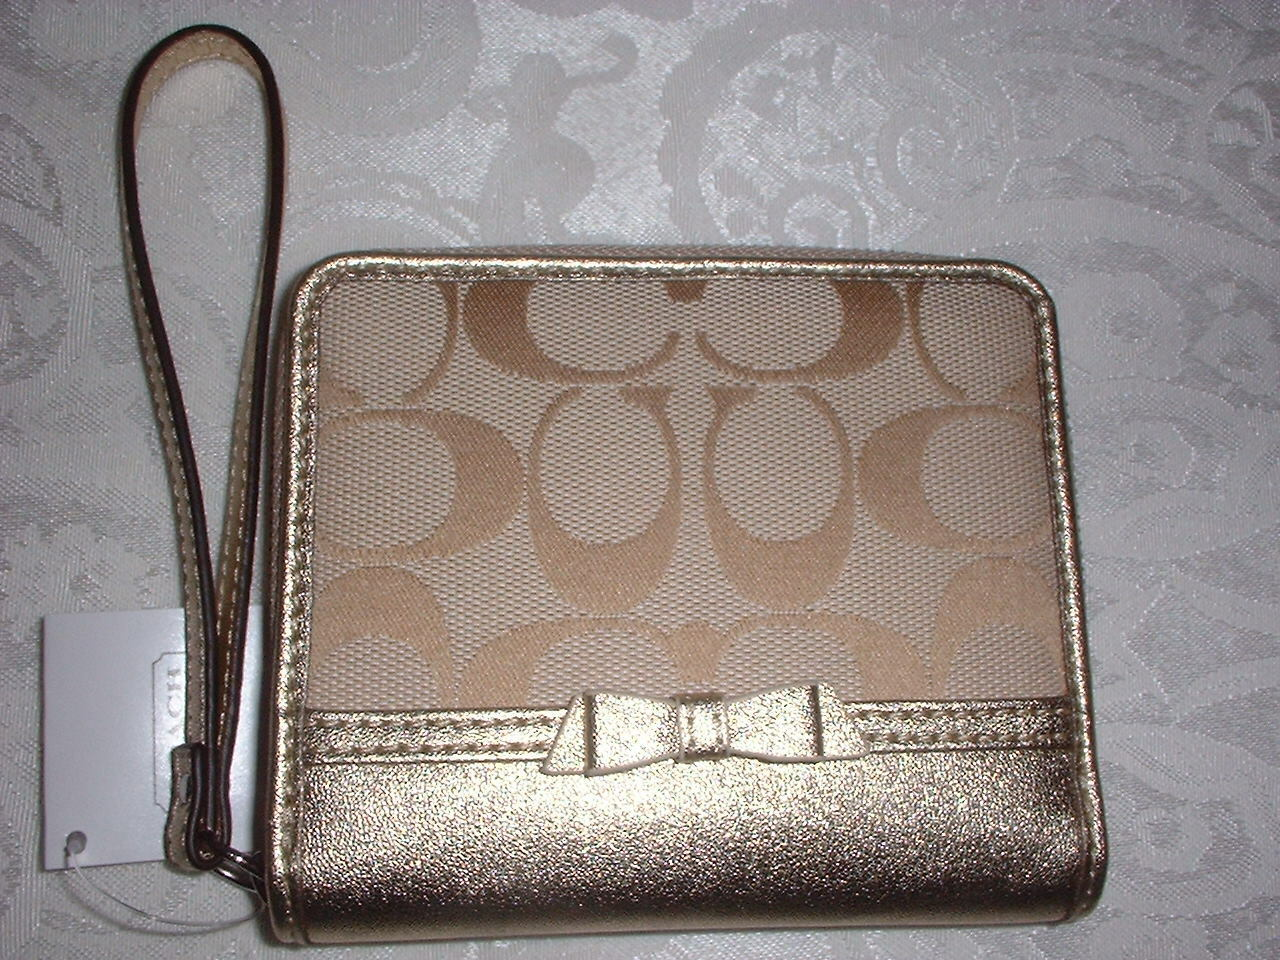 NWT Coach Signature Bow Medium Zip Around Wallet Wristlet Khaki Gold 48800